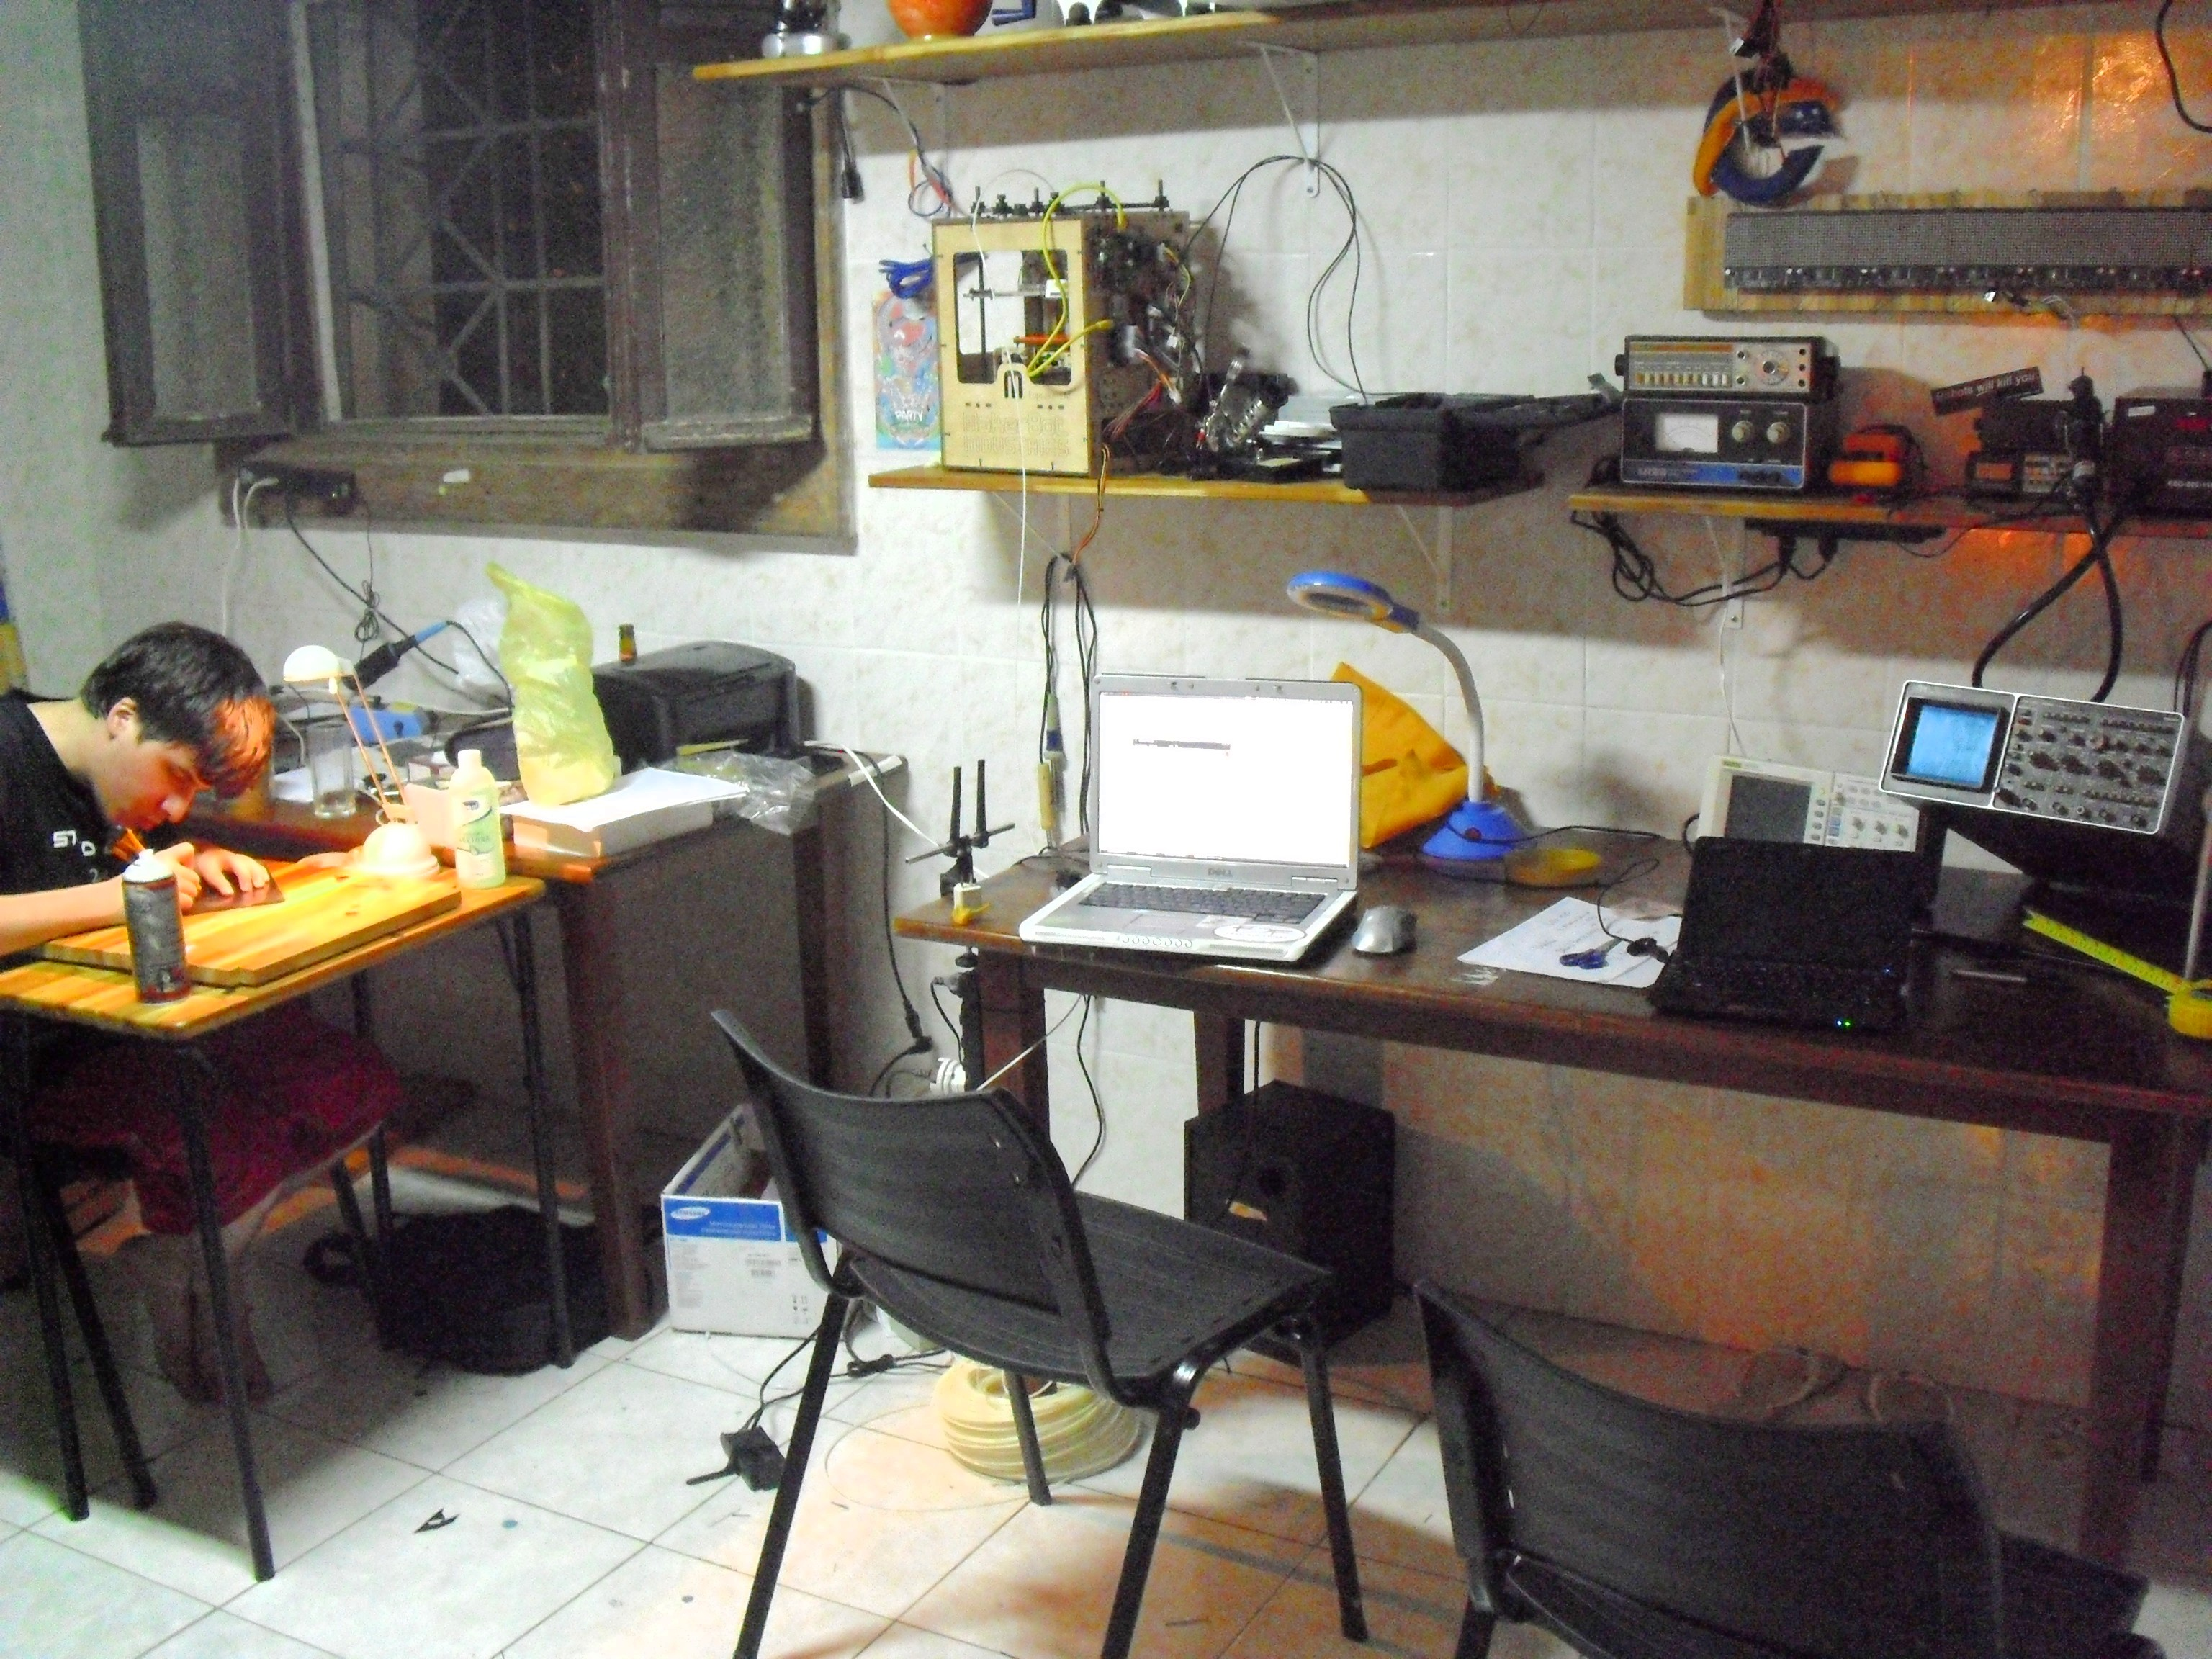 Ficheiro:Bancada Eletronica do Garoa Hacker Clube.JPG – Wikipédia  #AA7021 3072x2304